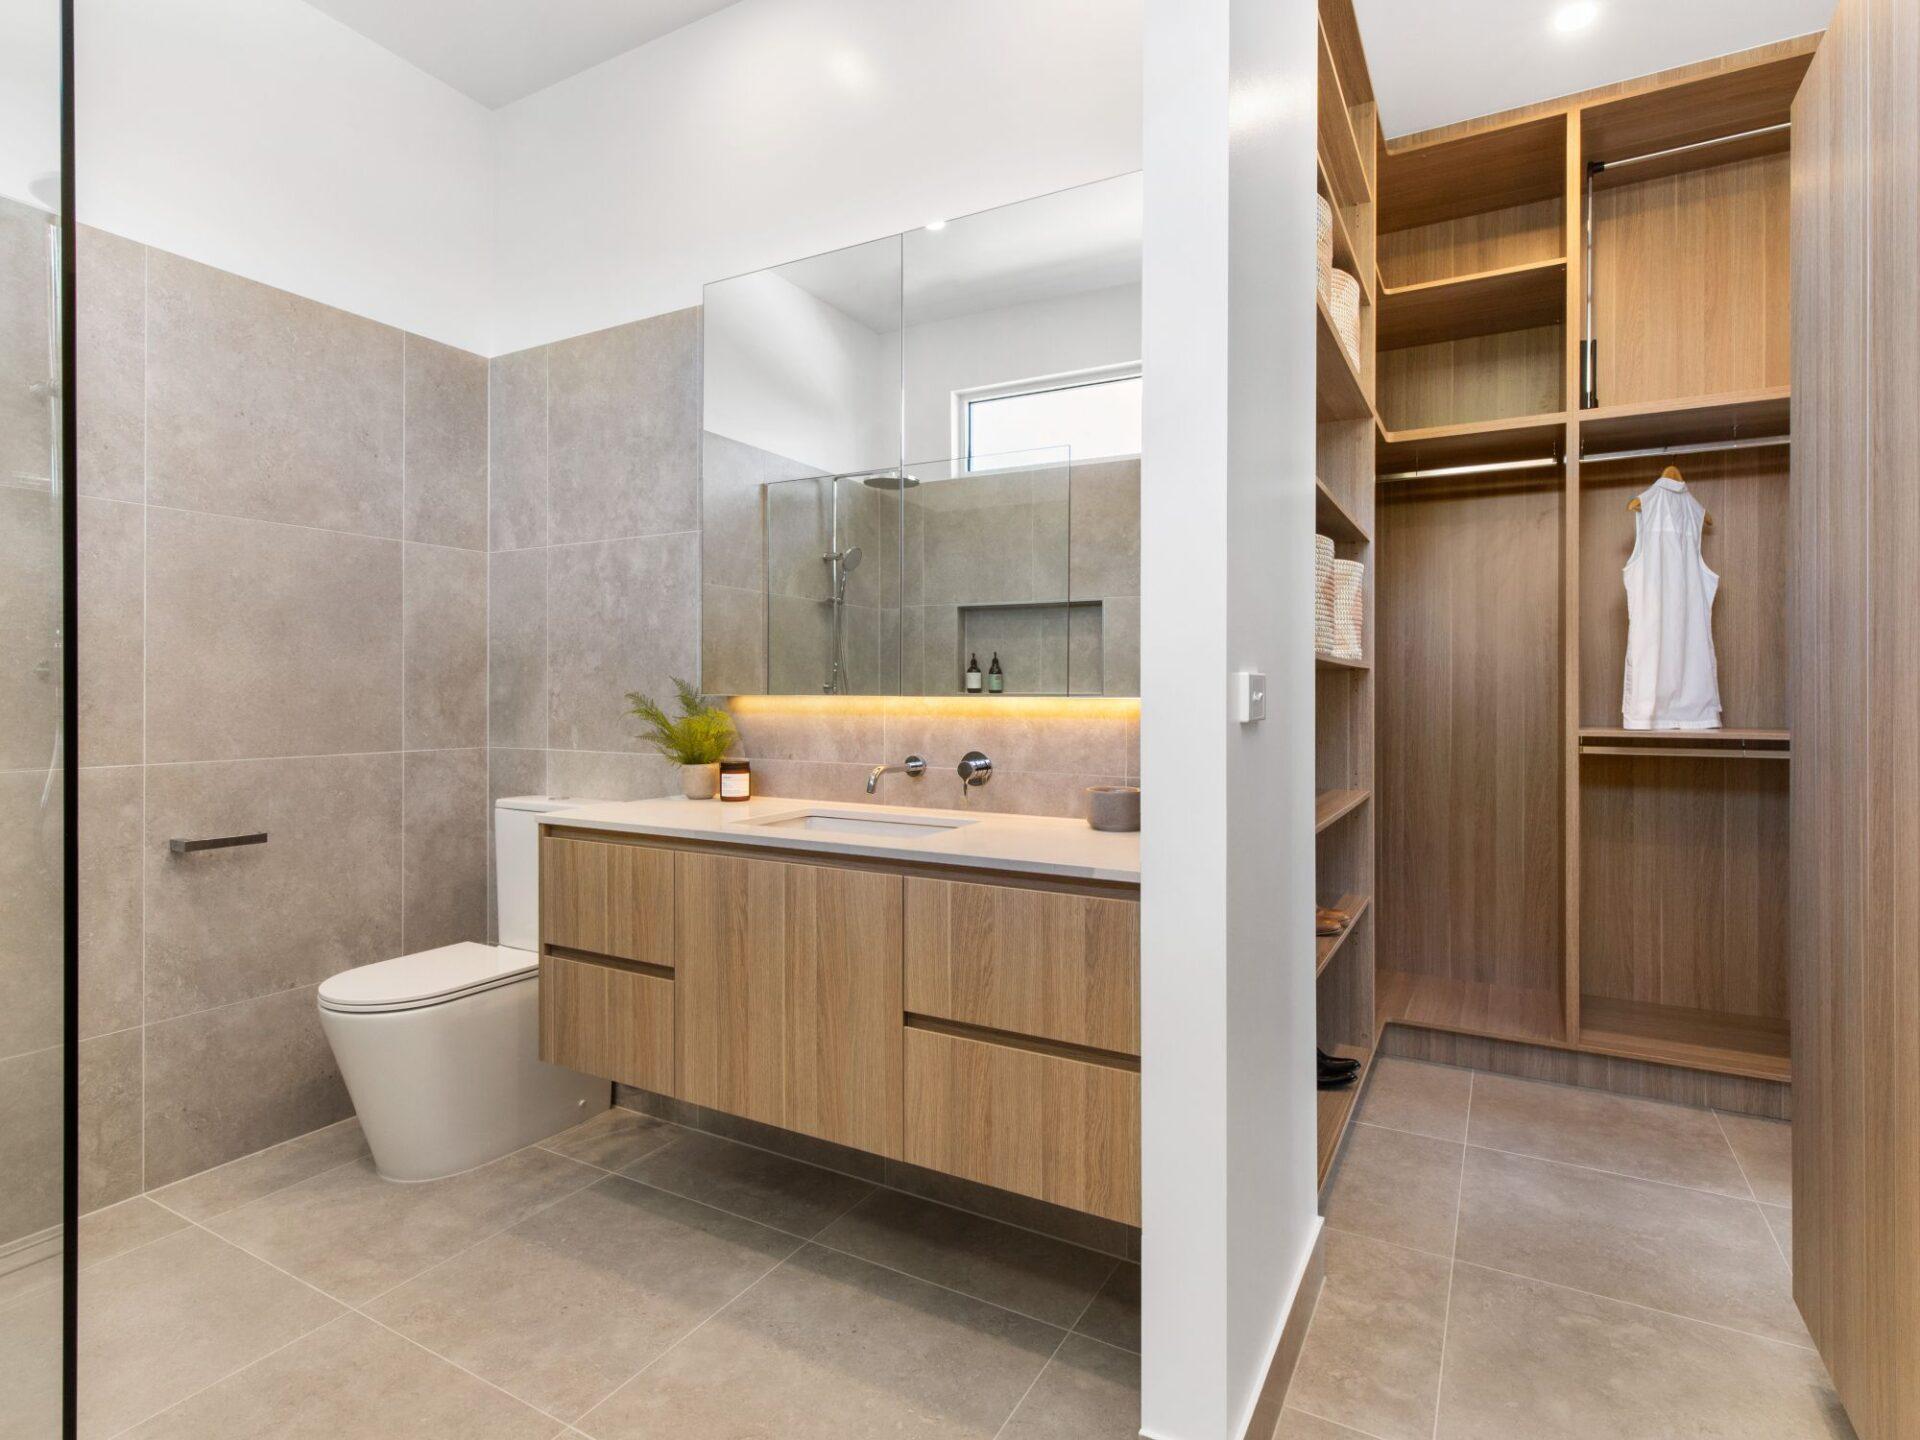 Bathroom Cabinet Renovations - Bayview Renovations